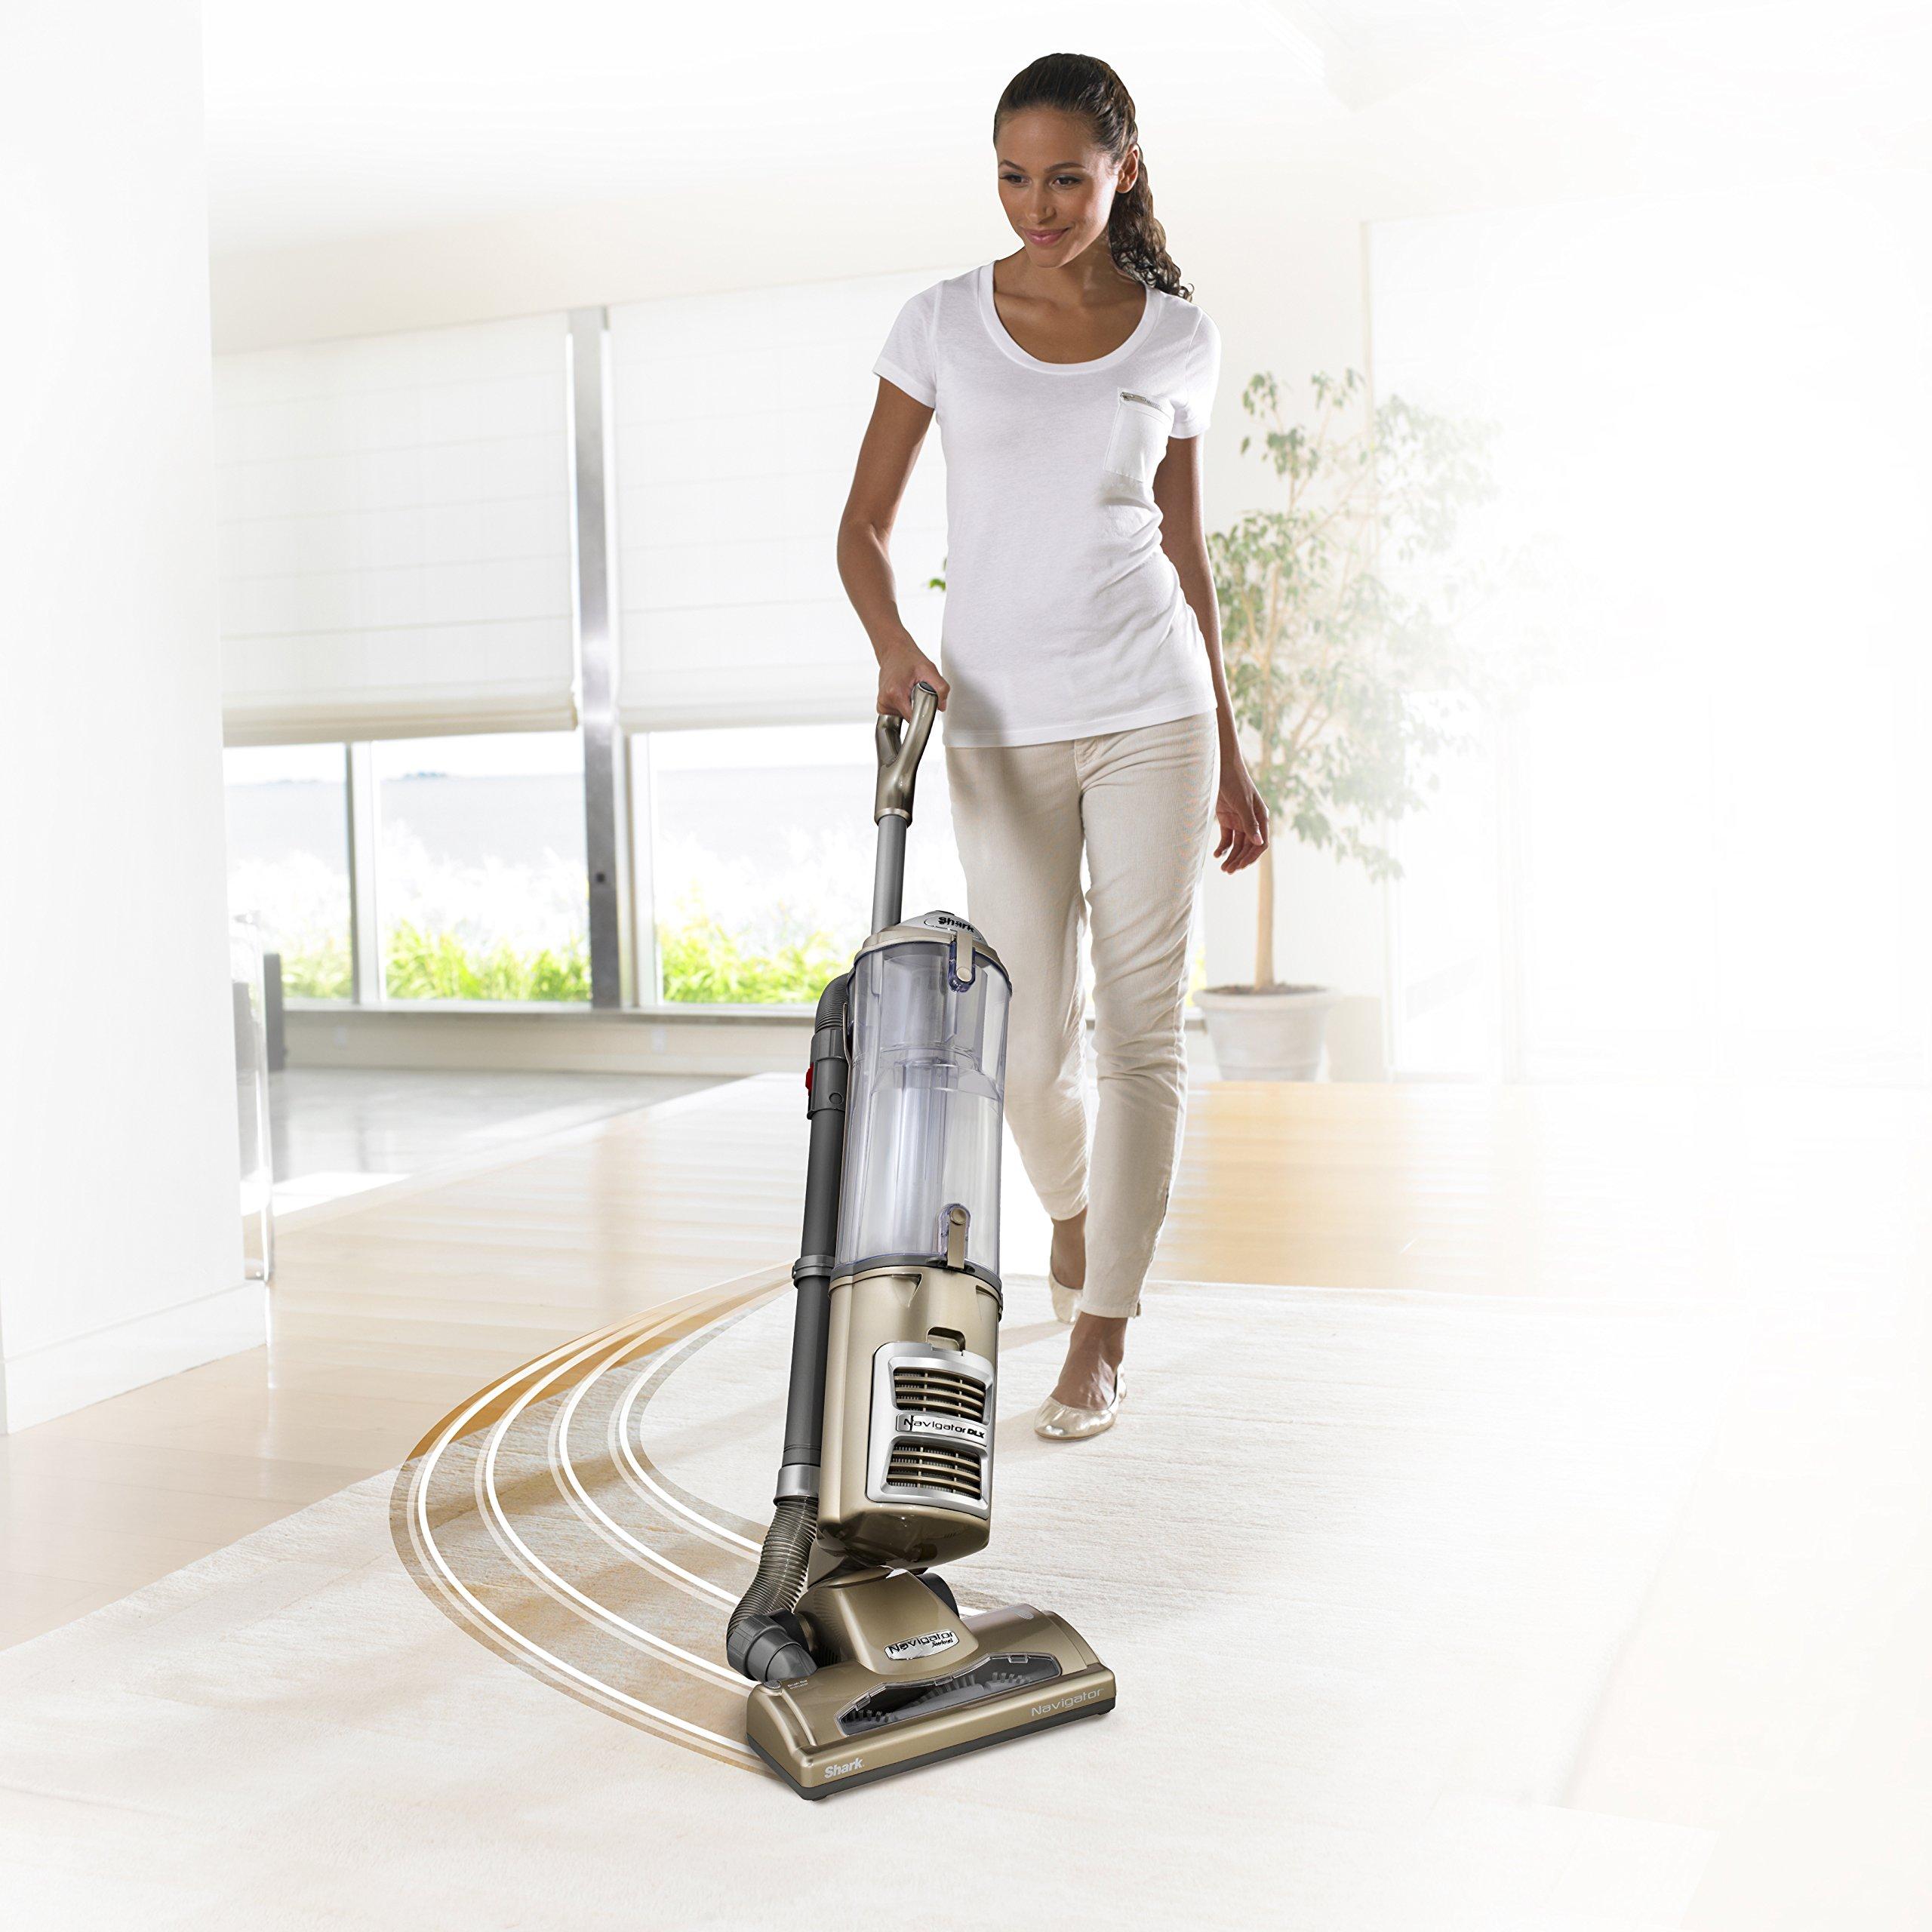 Shark Navigator Professional Upright Vacuum, Gold and Silver (NV70) by SharkNinja (Image #1)